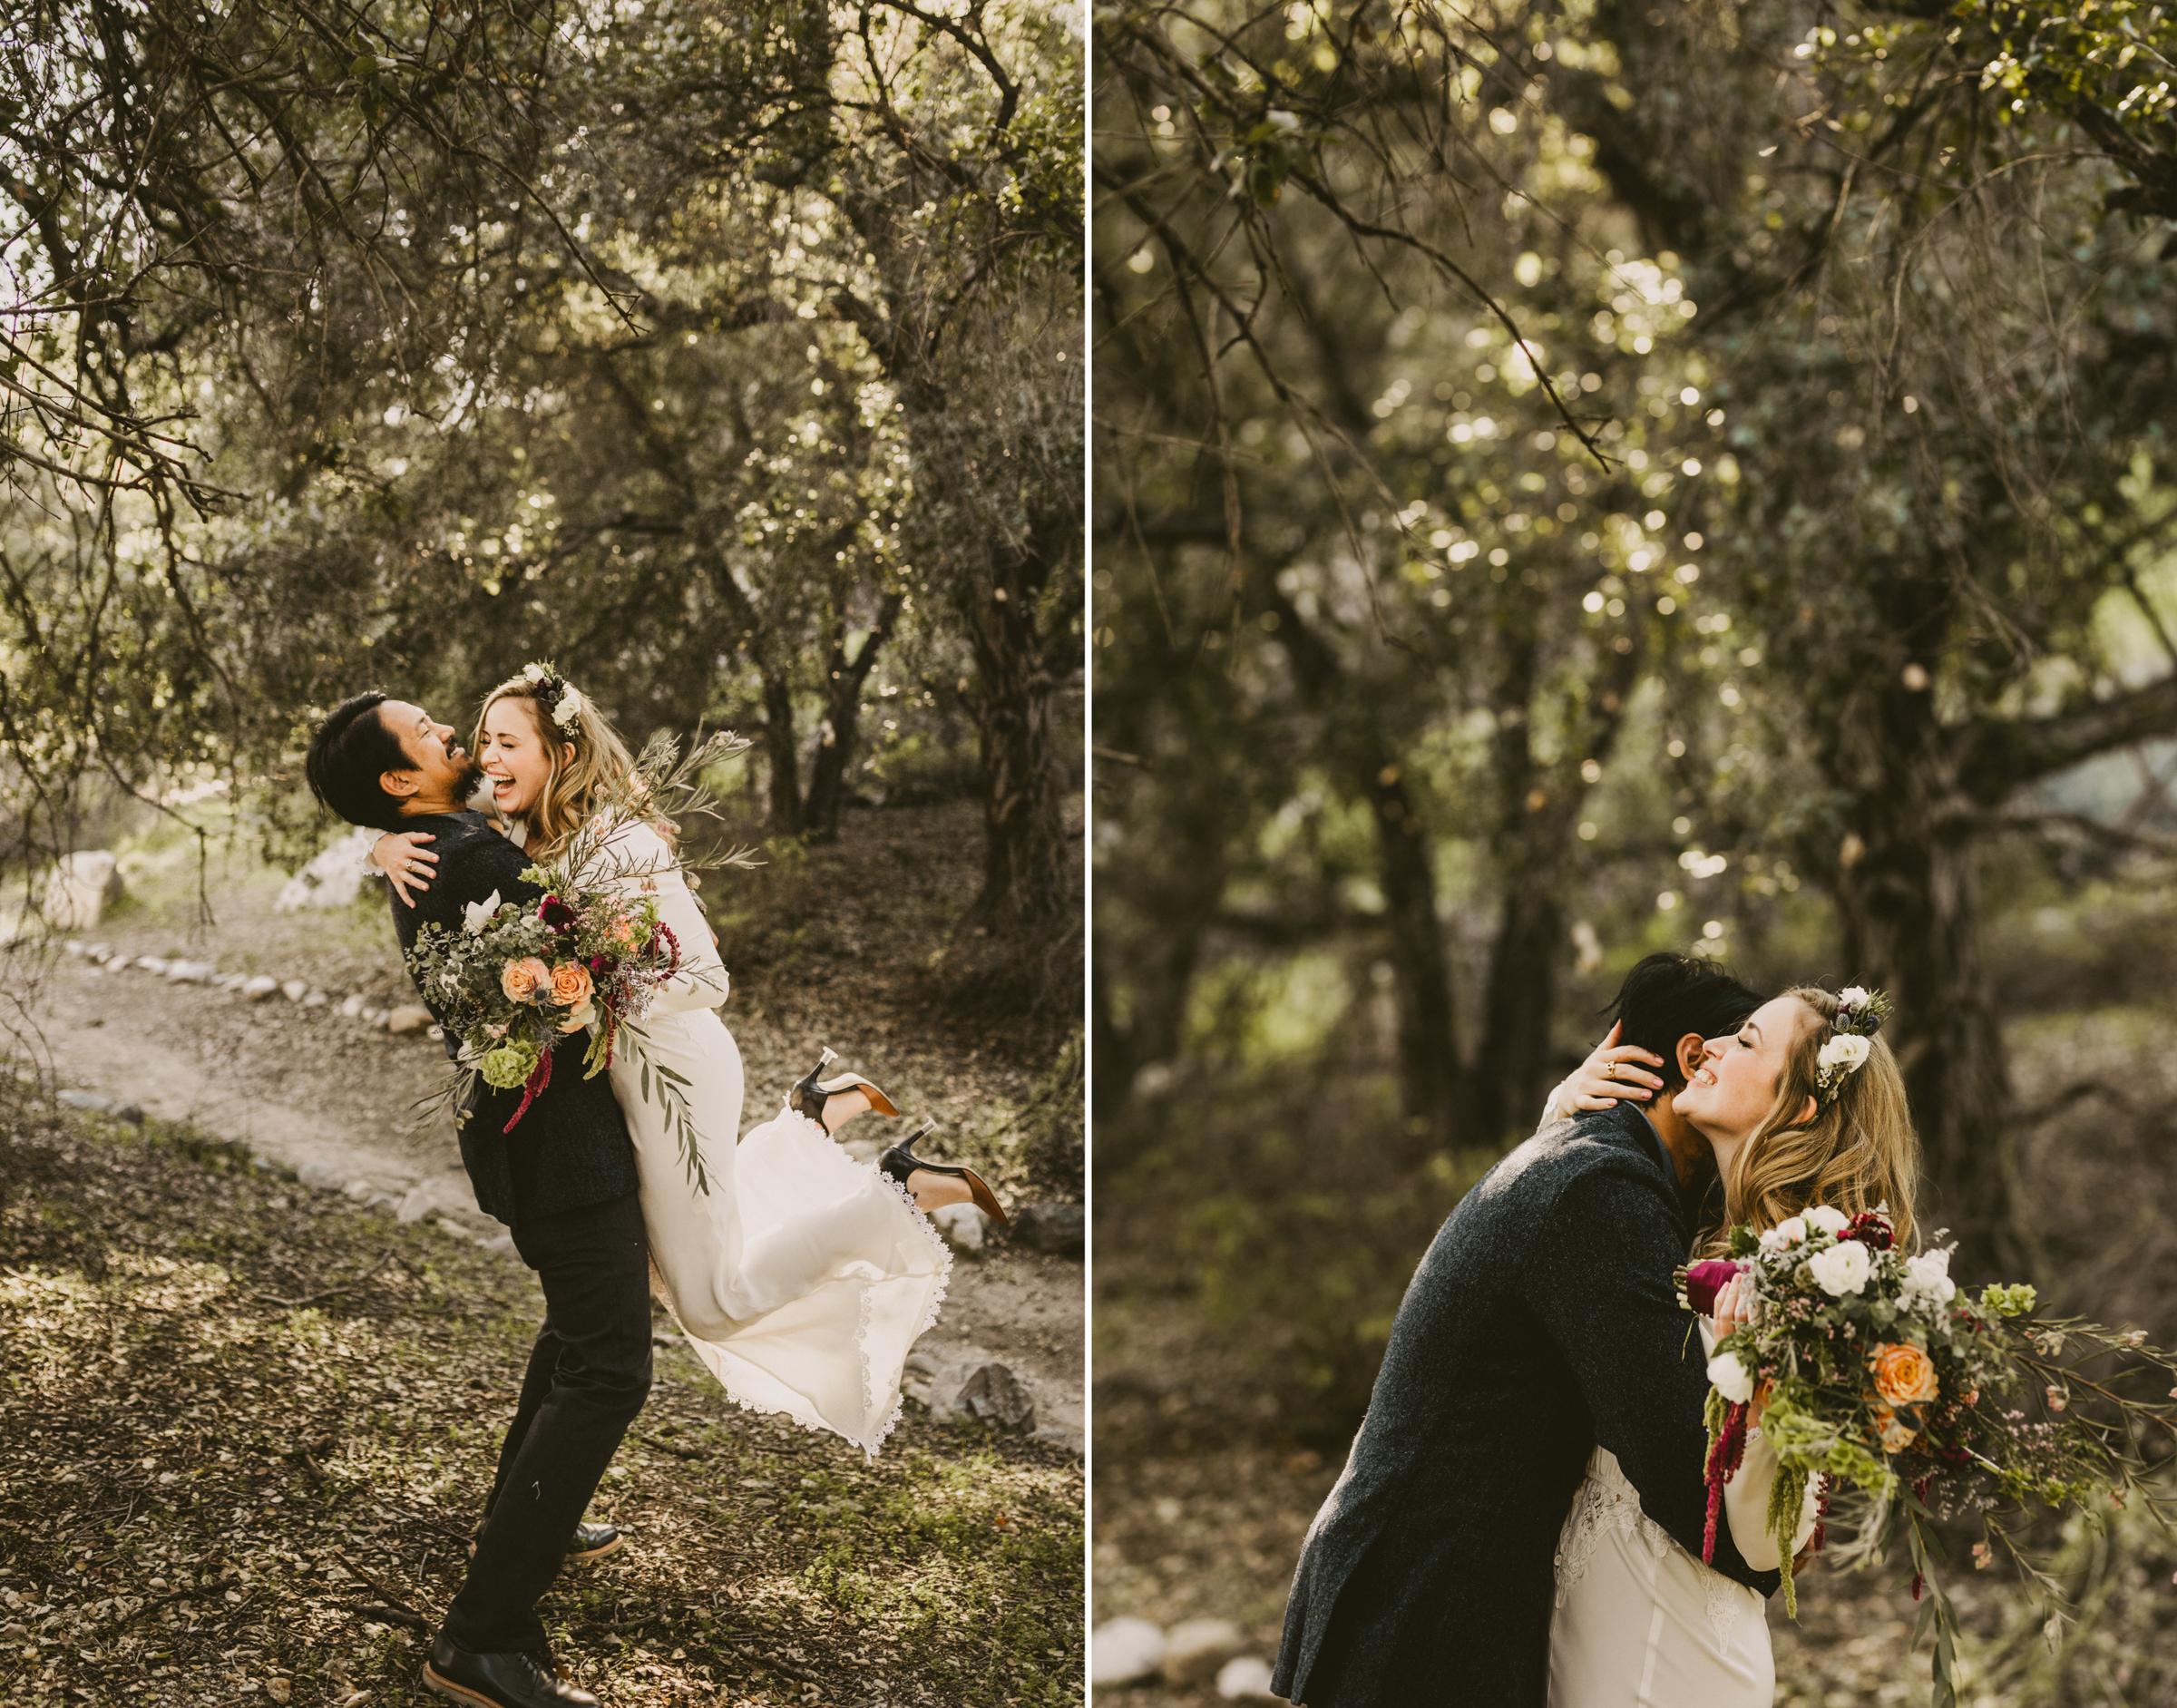 ©Isaiah + Taylor Photography - Intimate Elopement, Eaton Canyon, Los Angeles Wedding Photographer-15.jpg